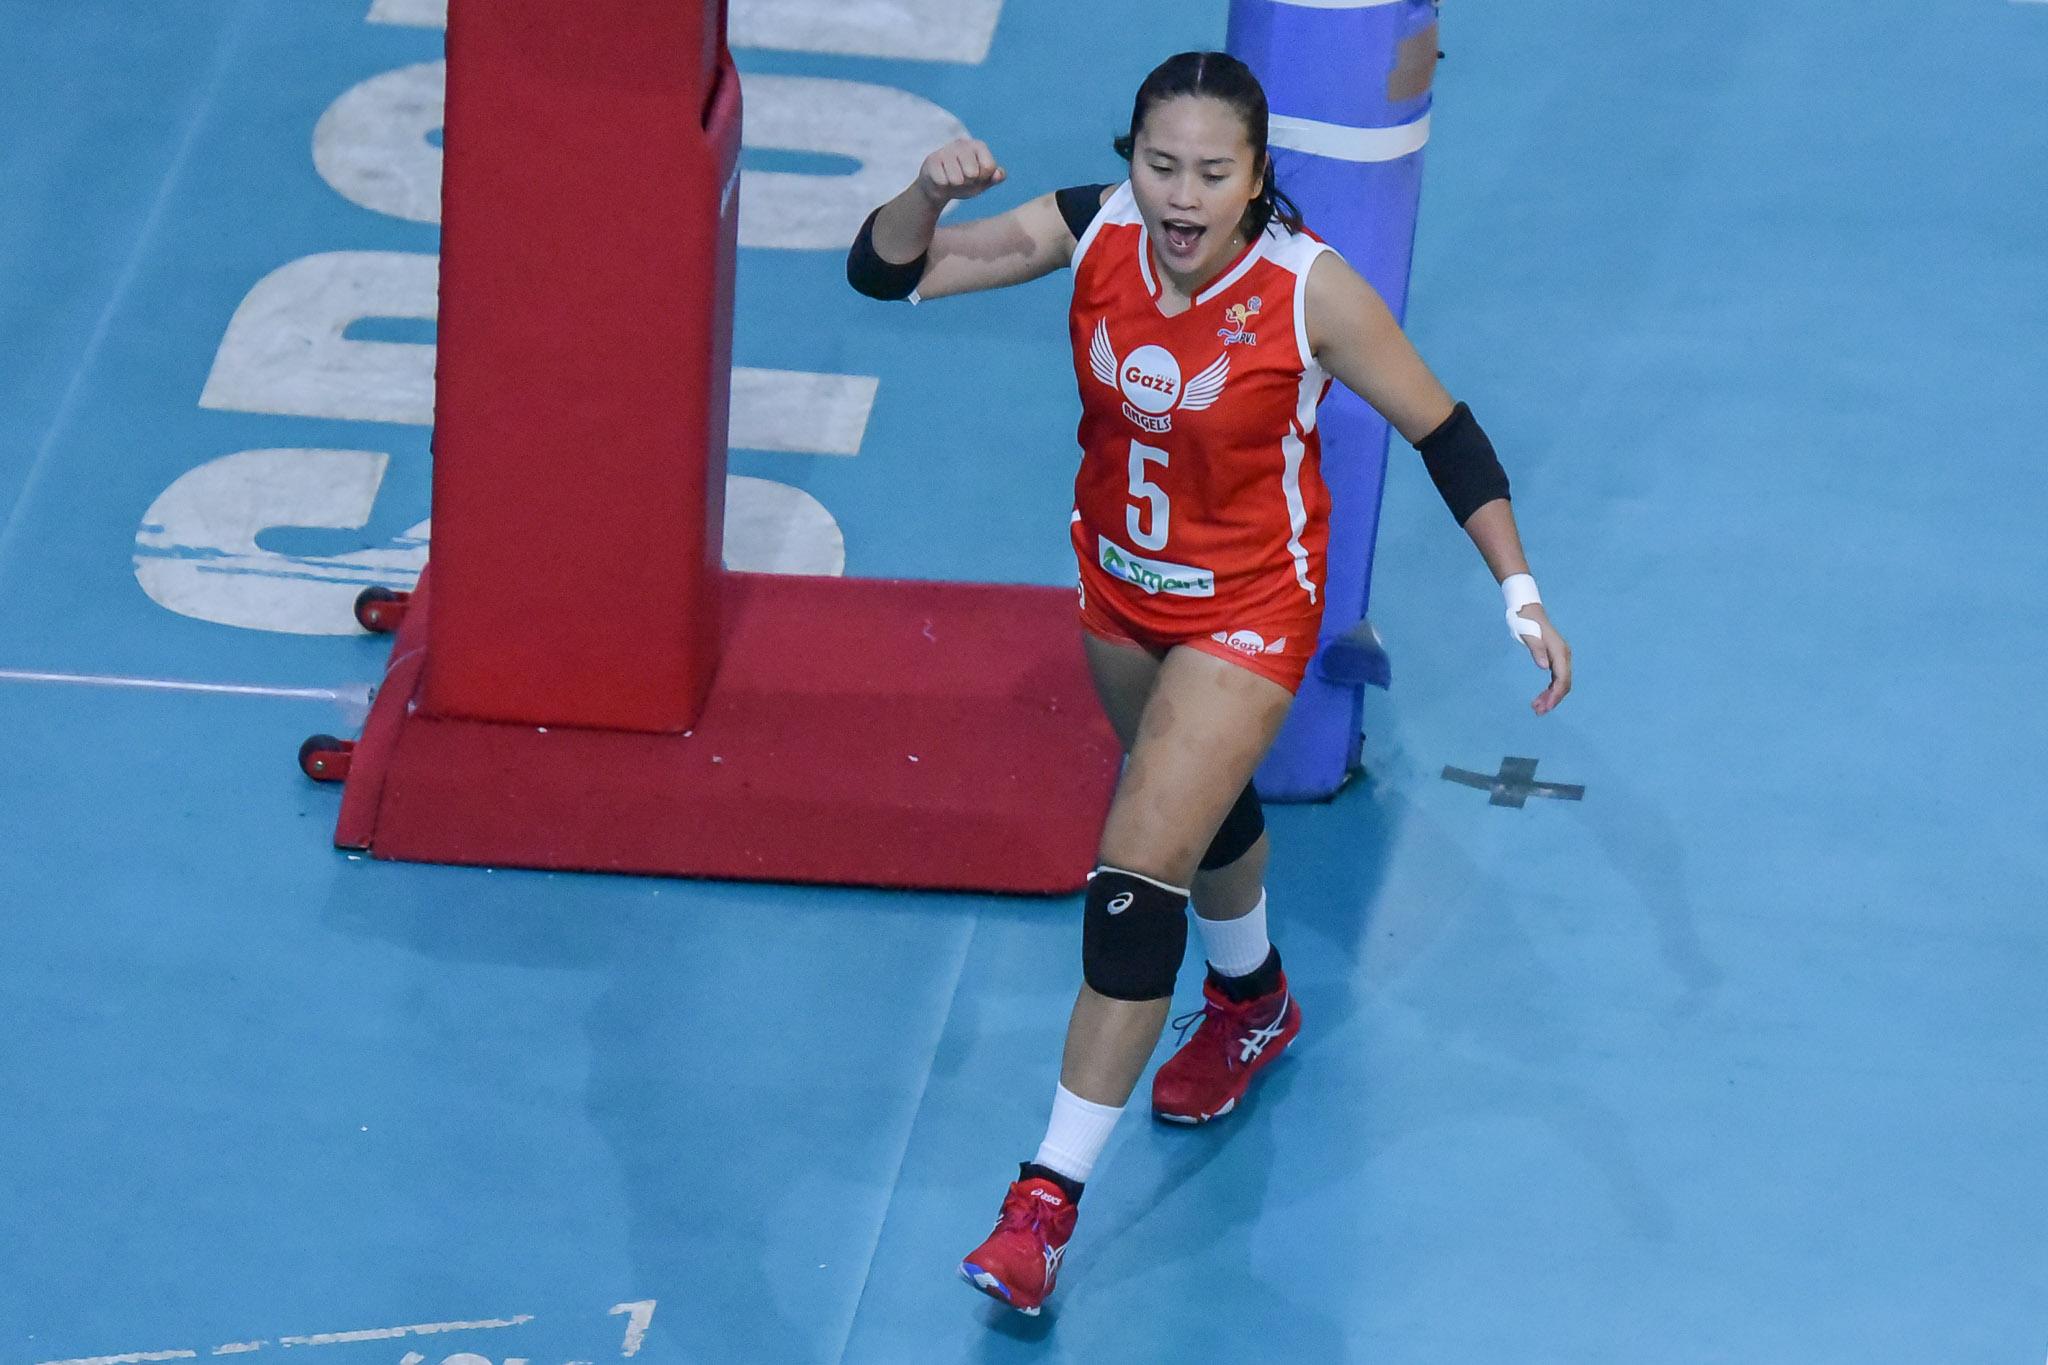 2021-PVL-Open-Petrogazz-vs.-Creamline-Semis-G2-Grethcel-Soltones-3167 Petro Gazz never reached peak in PVL bubble, laments Laniog News PVL Volleyball  - philippine sports news